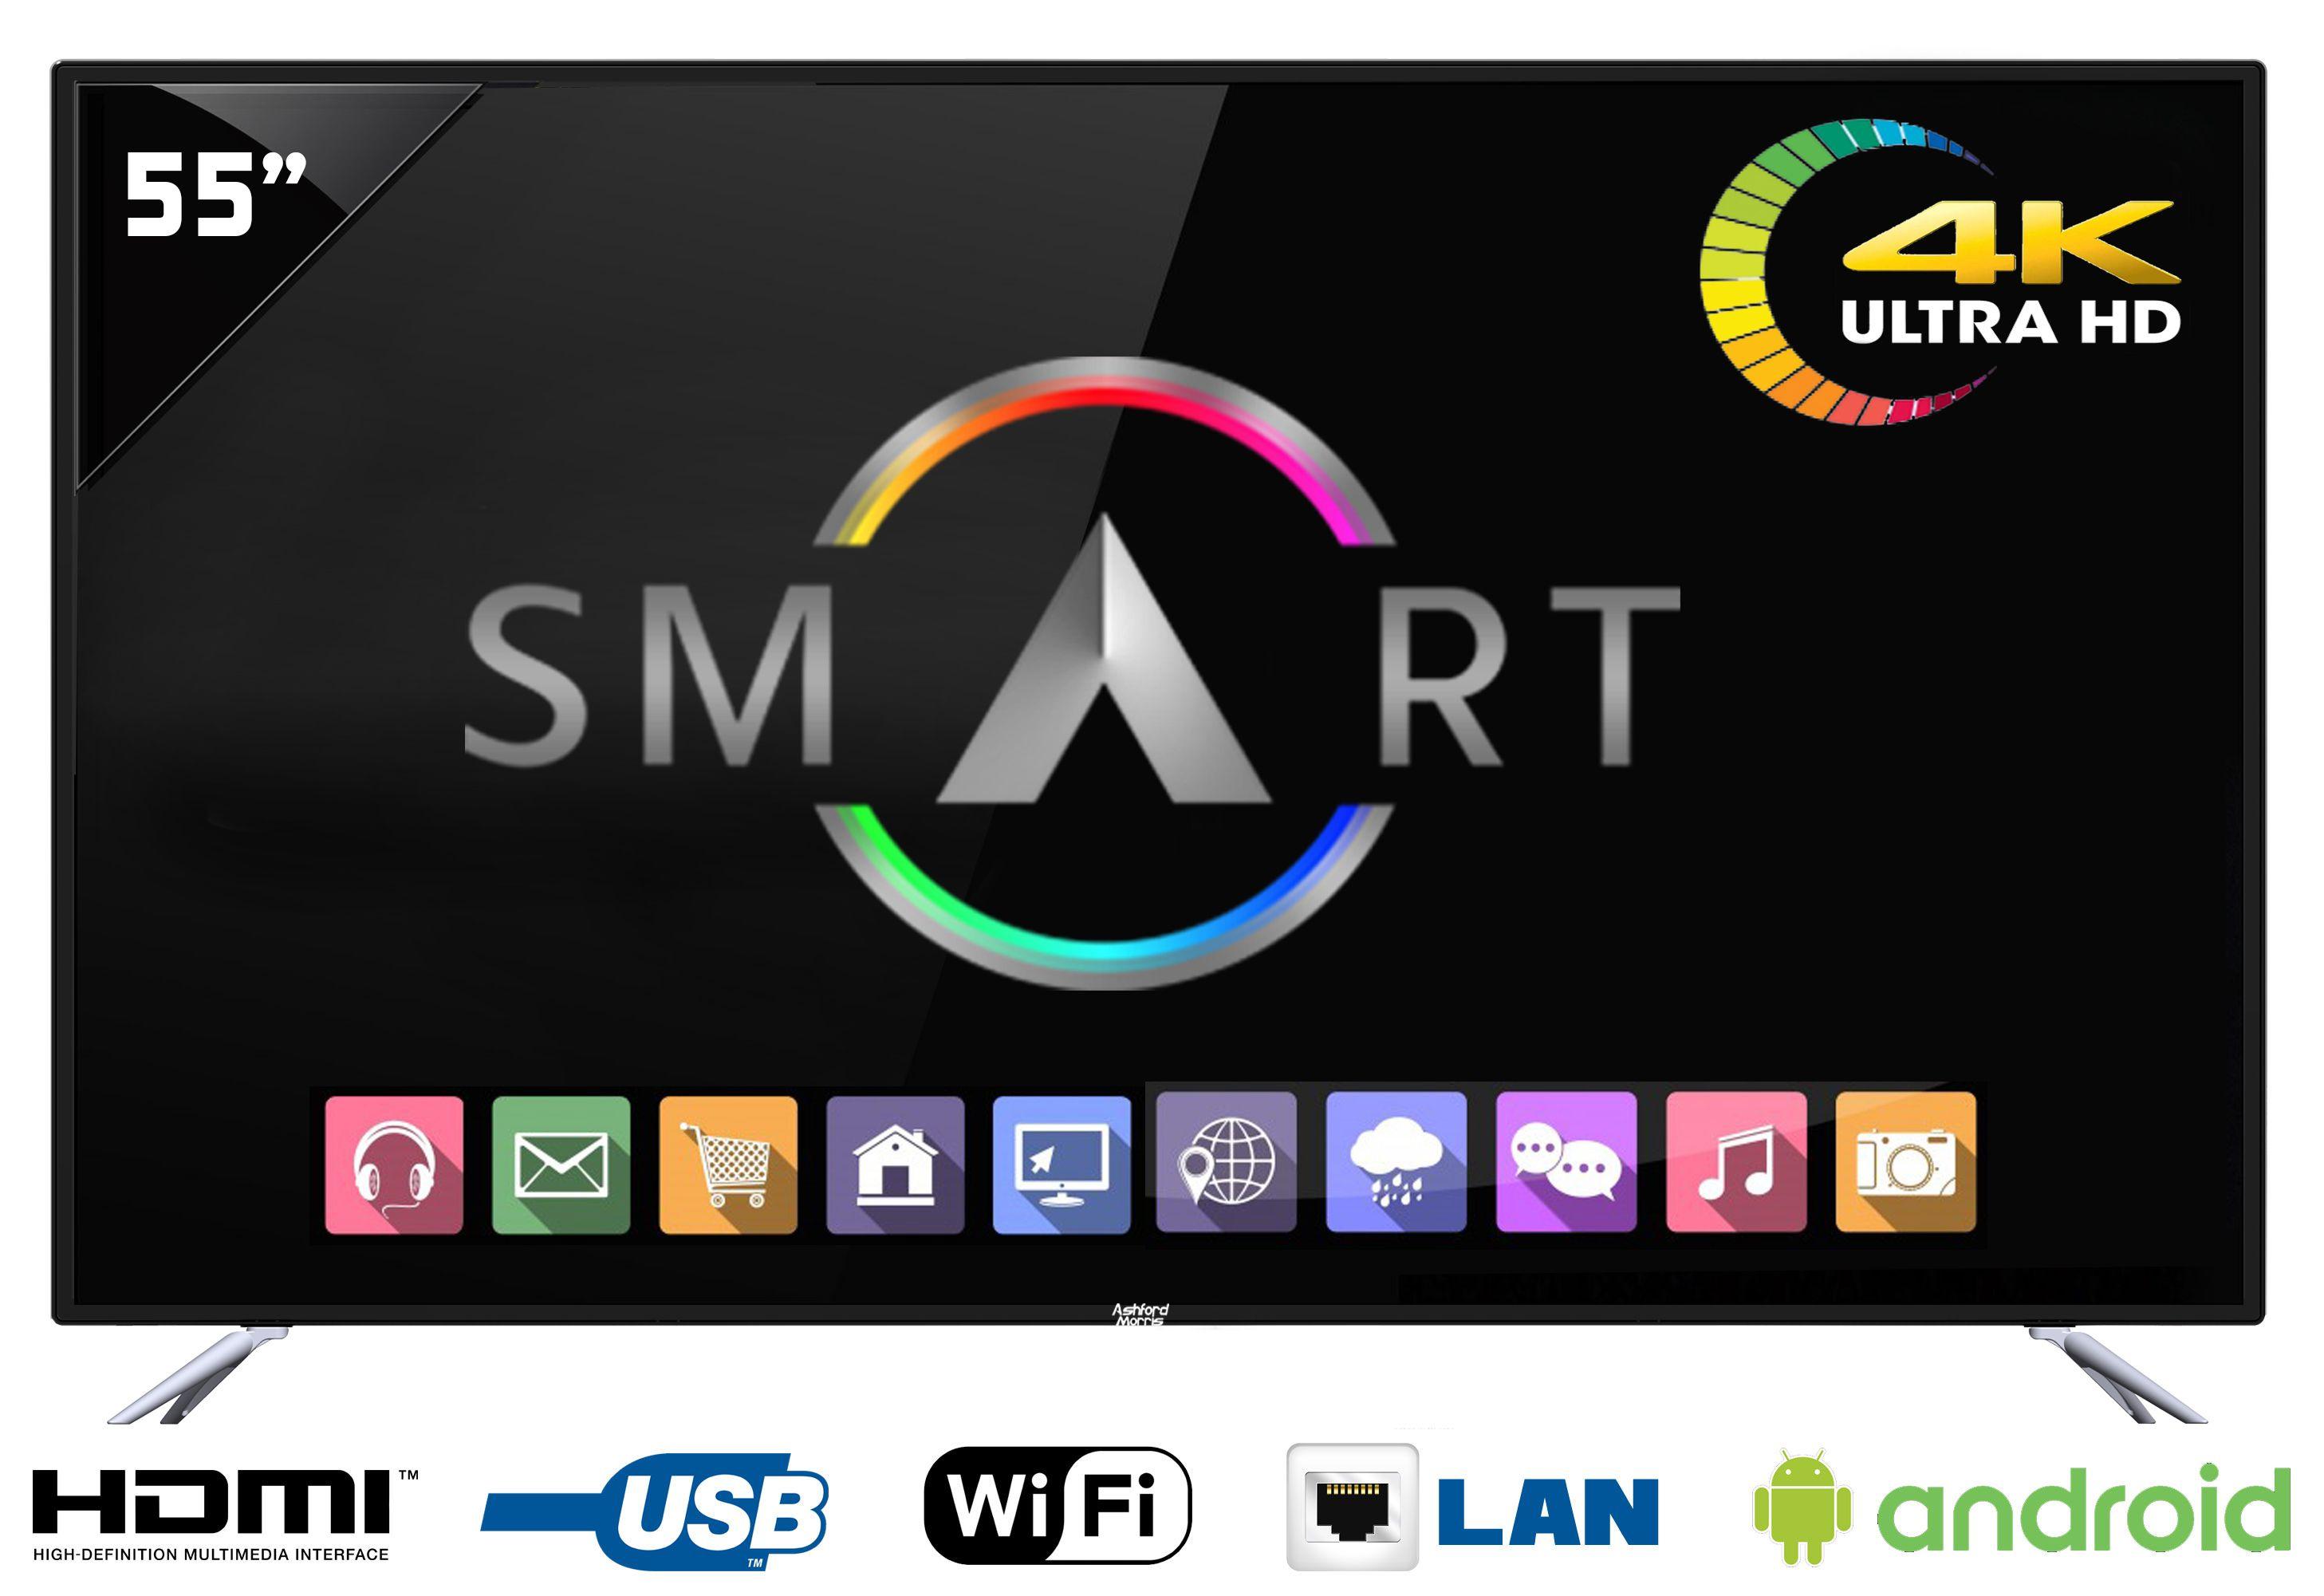 Ashford Morris AM 5500 140 cm 55 Smart Ultra HD 4K LED Television